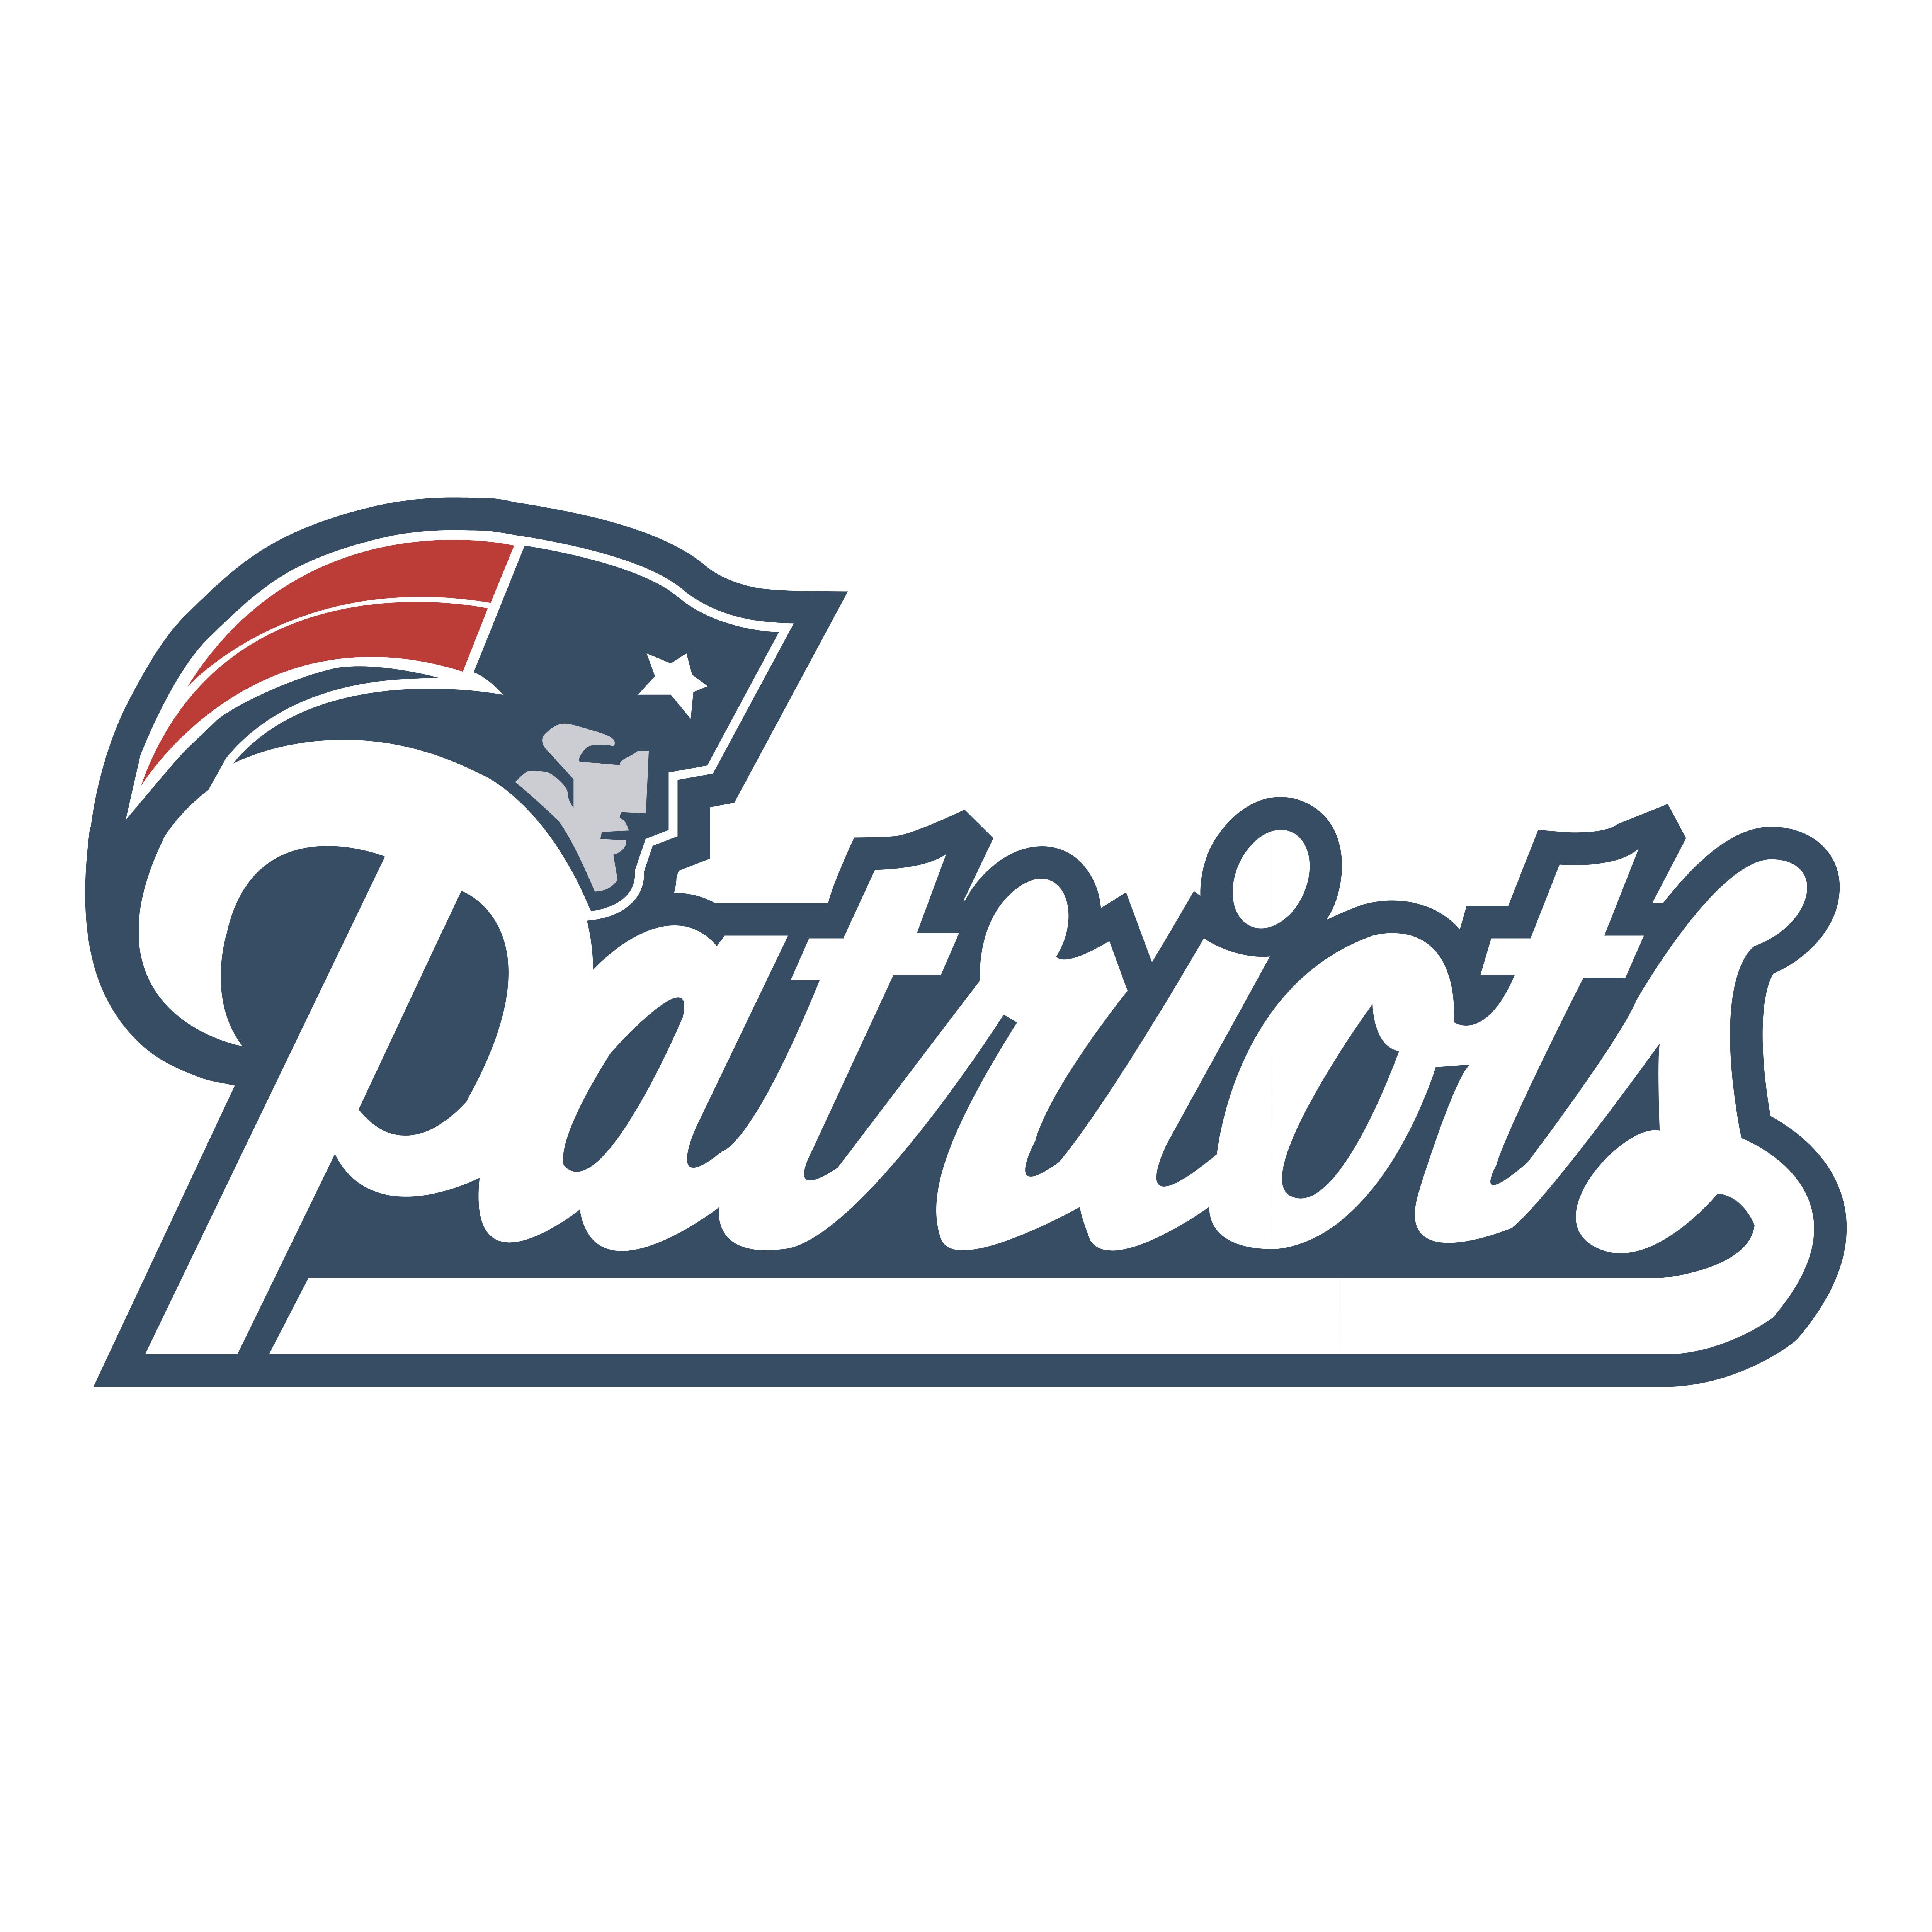 New England Patriots Logos Download